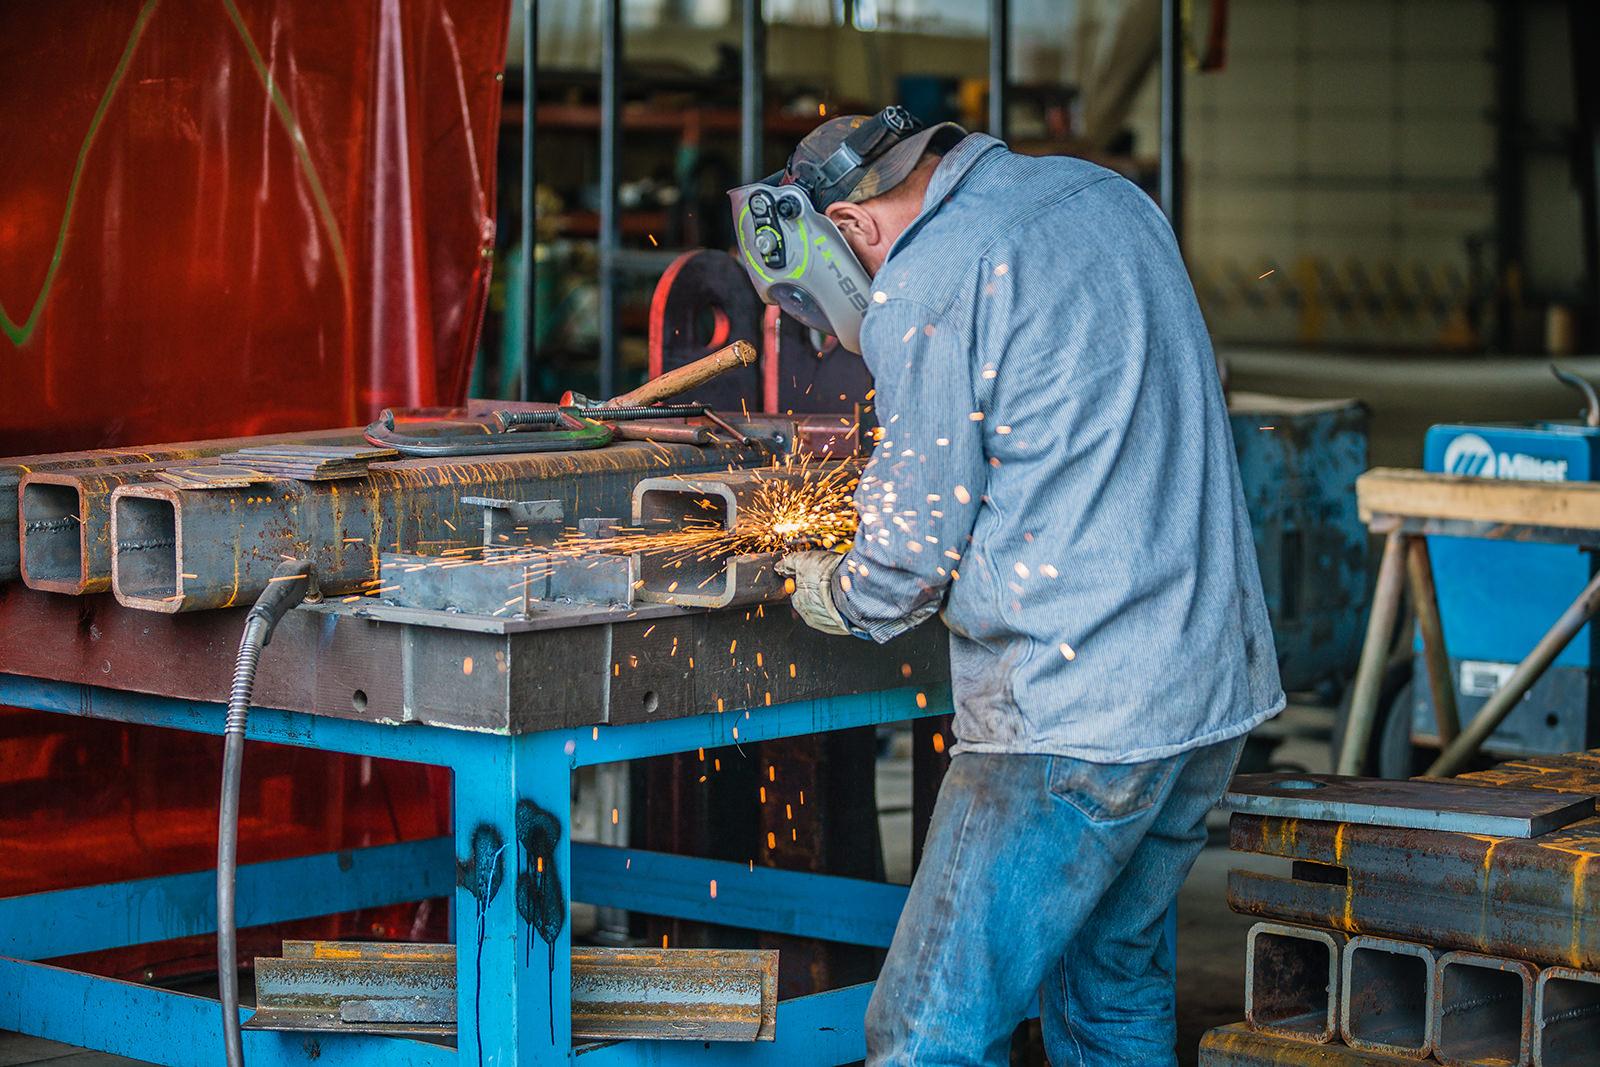 omega morgan millwright working on custom fabrication